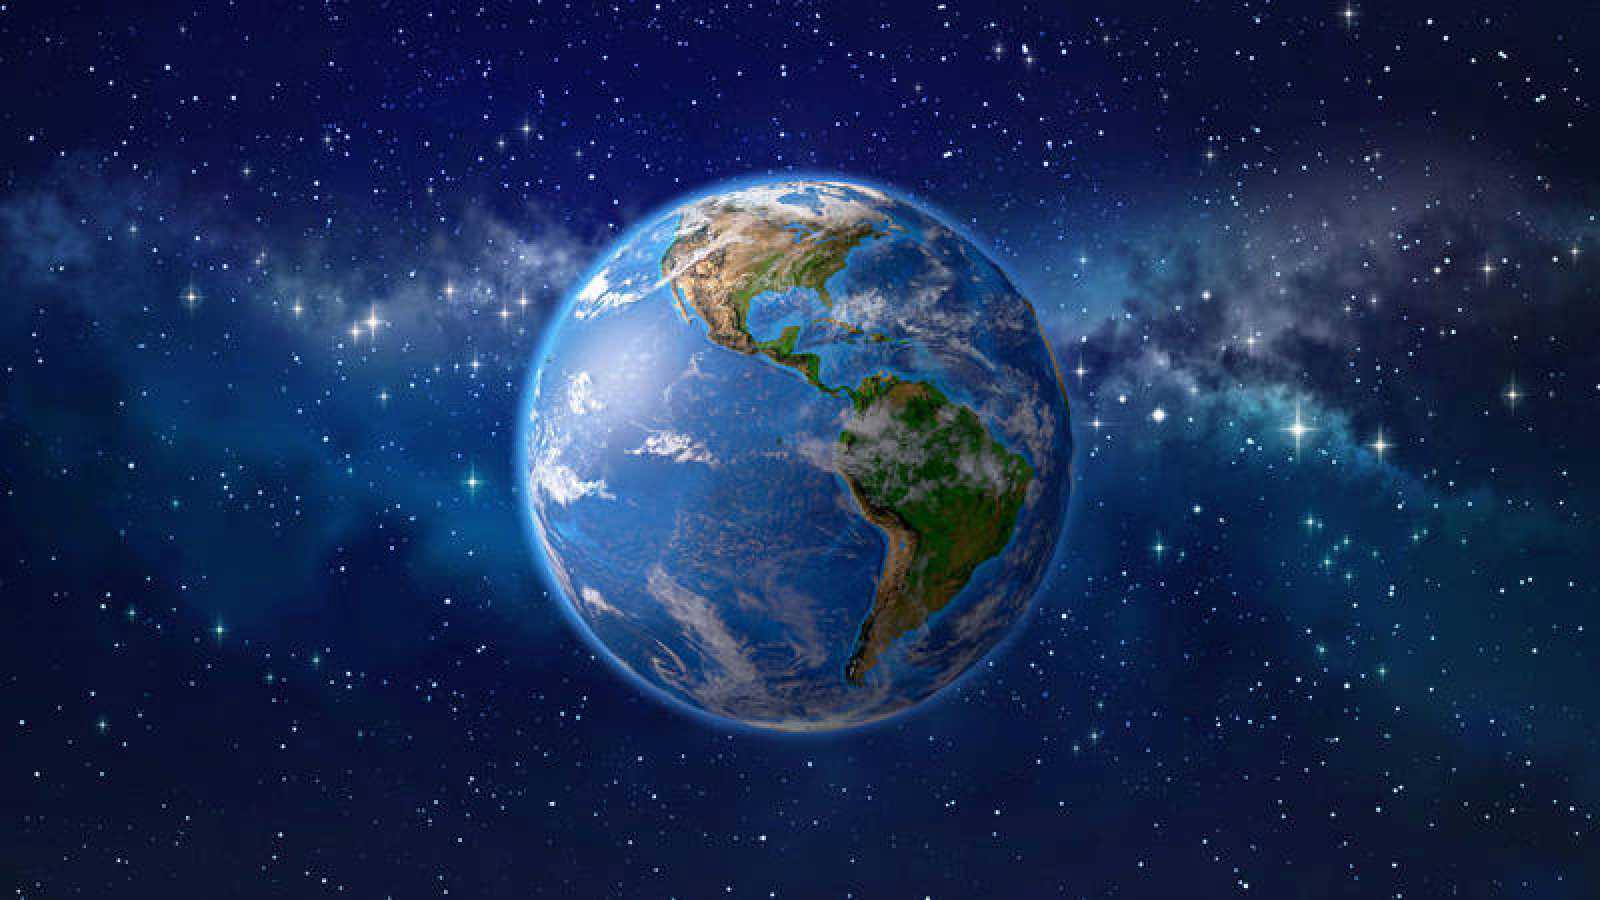 historia del planeta tierra